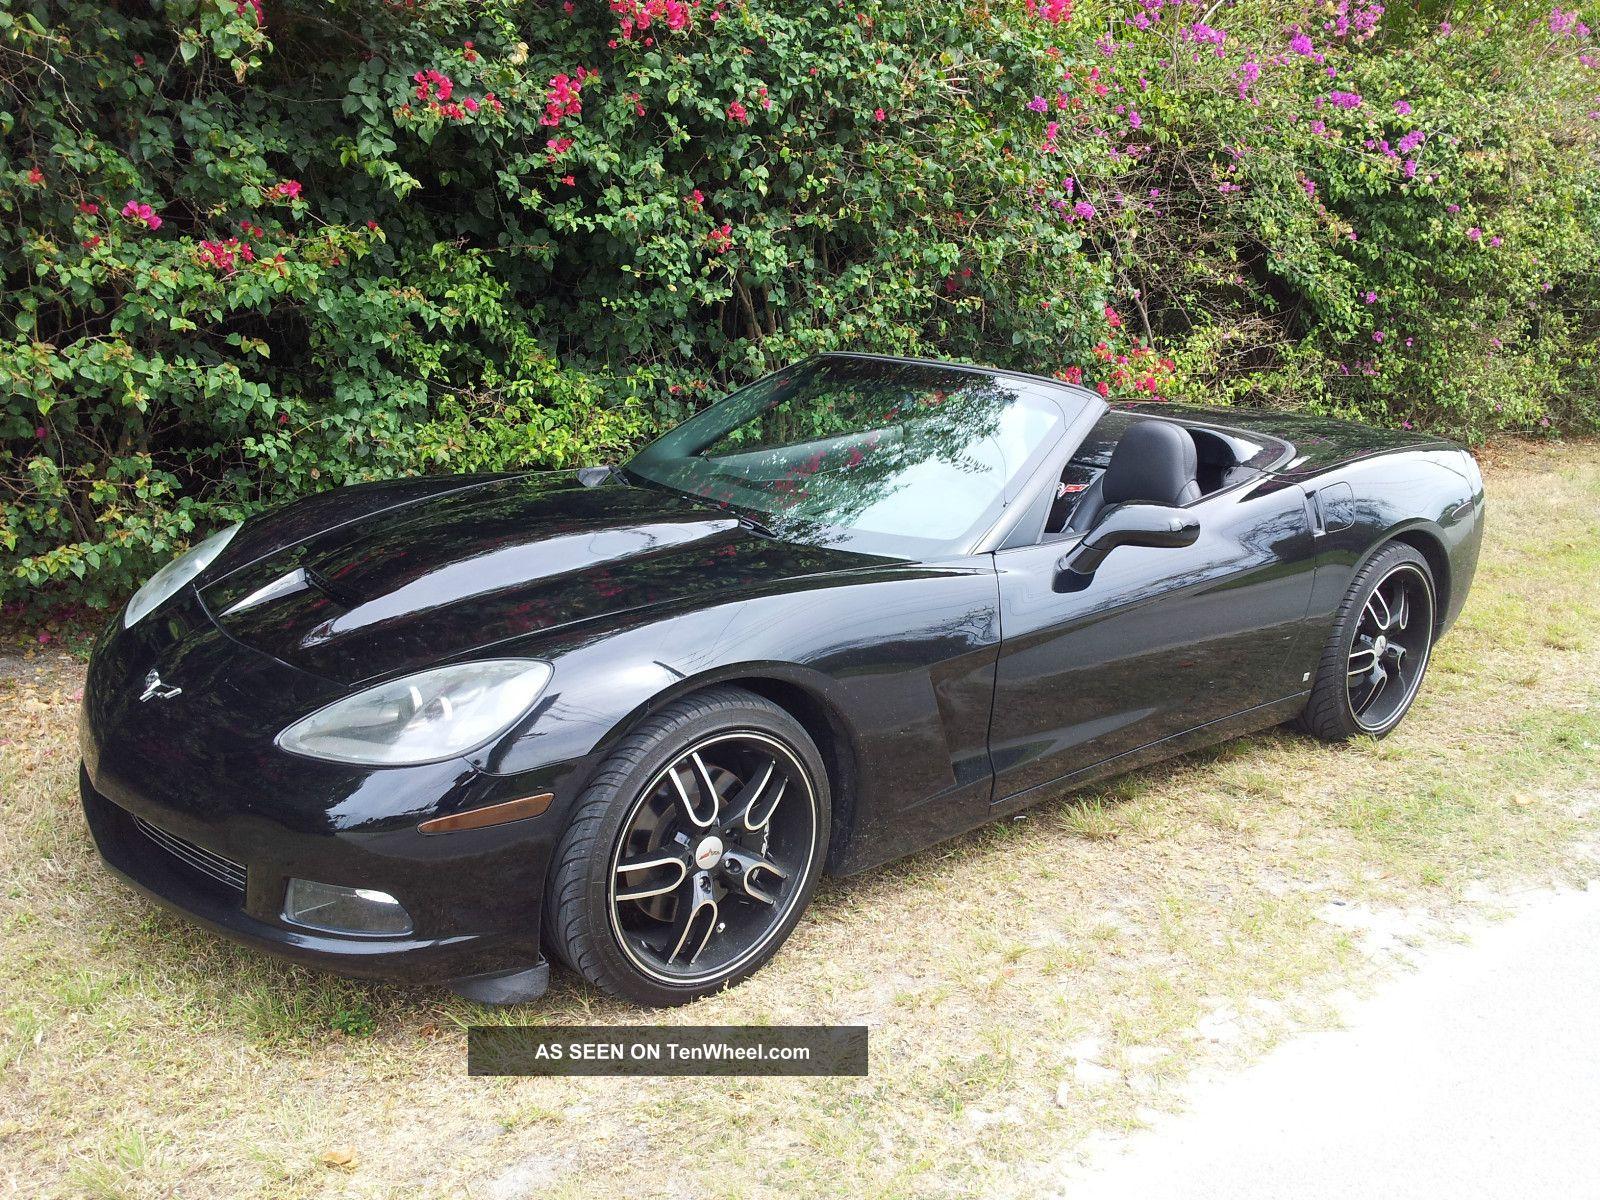 2008 Chevrolet Corvette Convertible 6.  2l - Triple Black Corvette photo